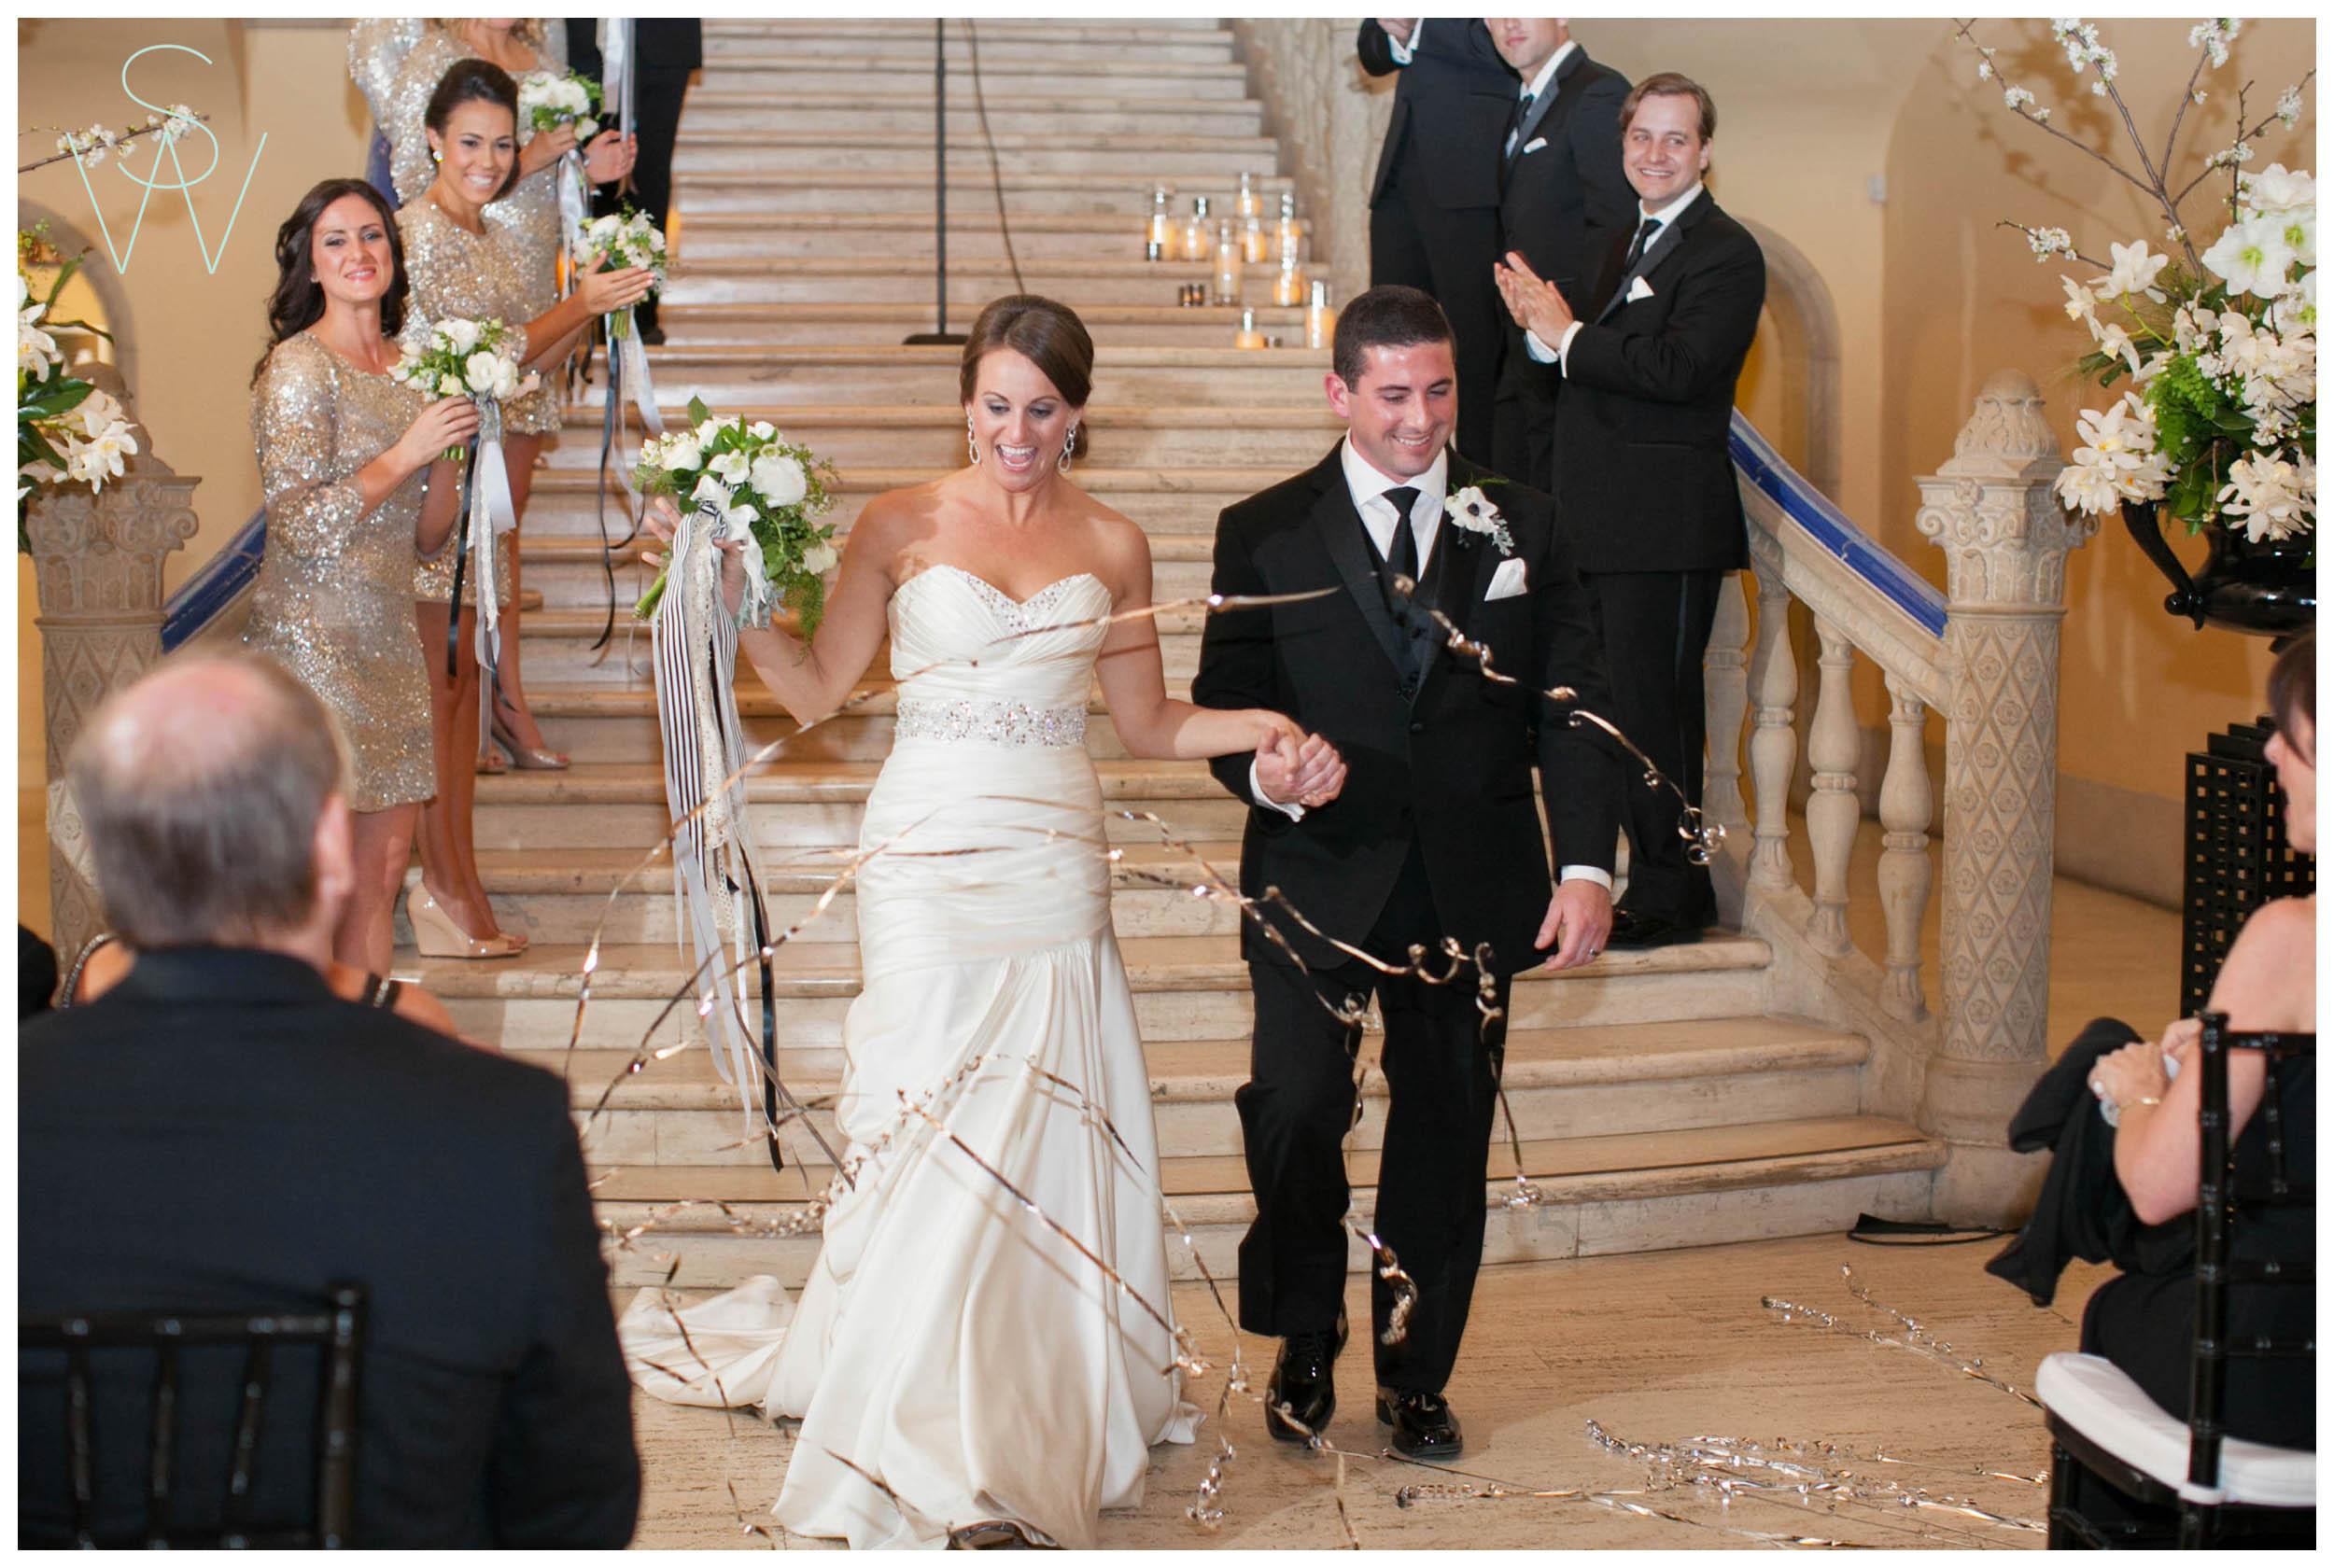 Shewanders.sdma_.wedding.photography-1058.jpg.wedding.photography-1058.jpg